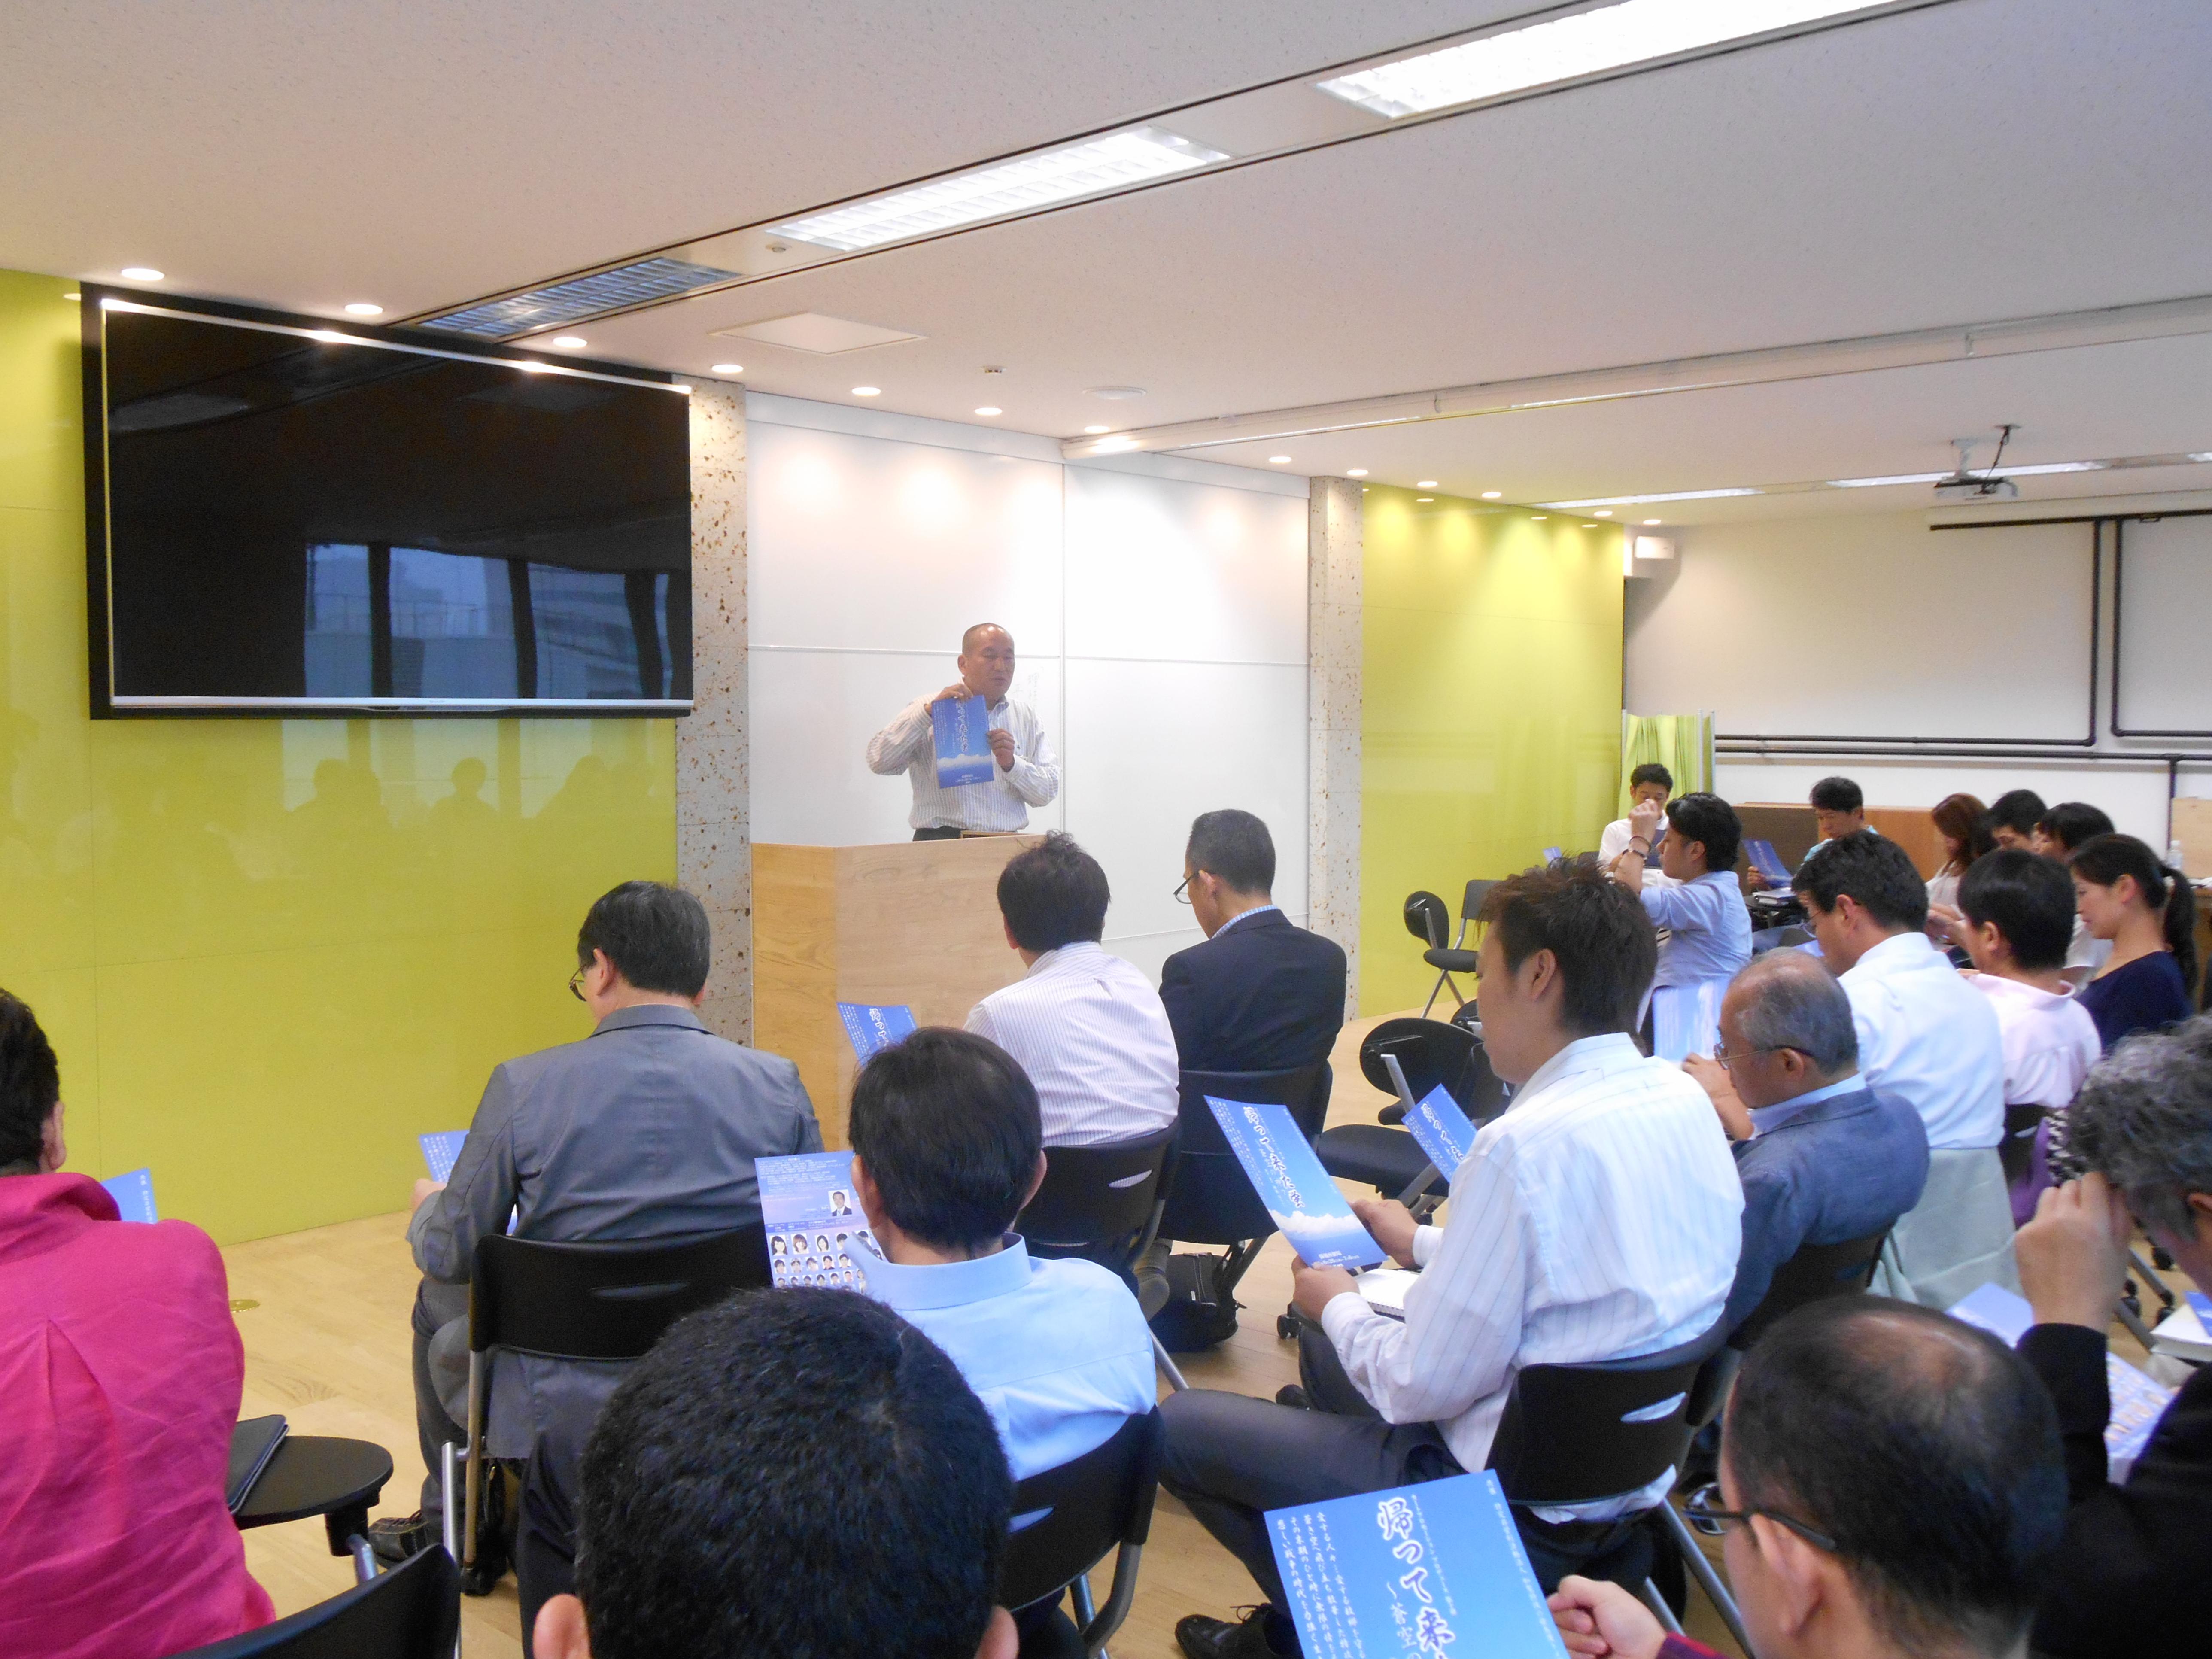 DSCN0543 - 8月2日芳村思風先生の東京思風塾第4回開催